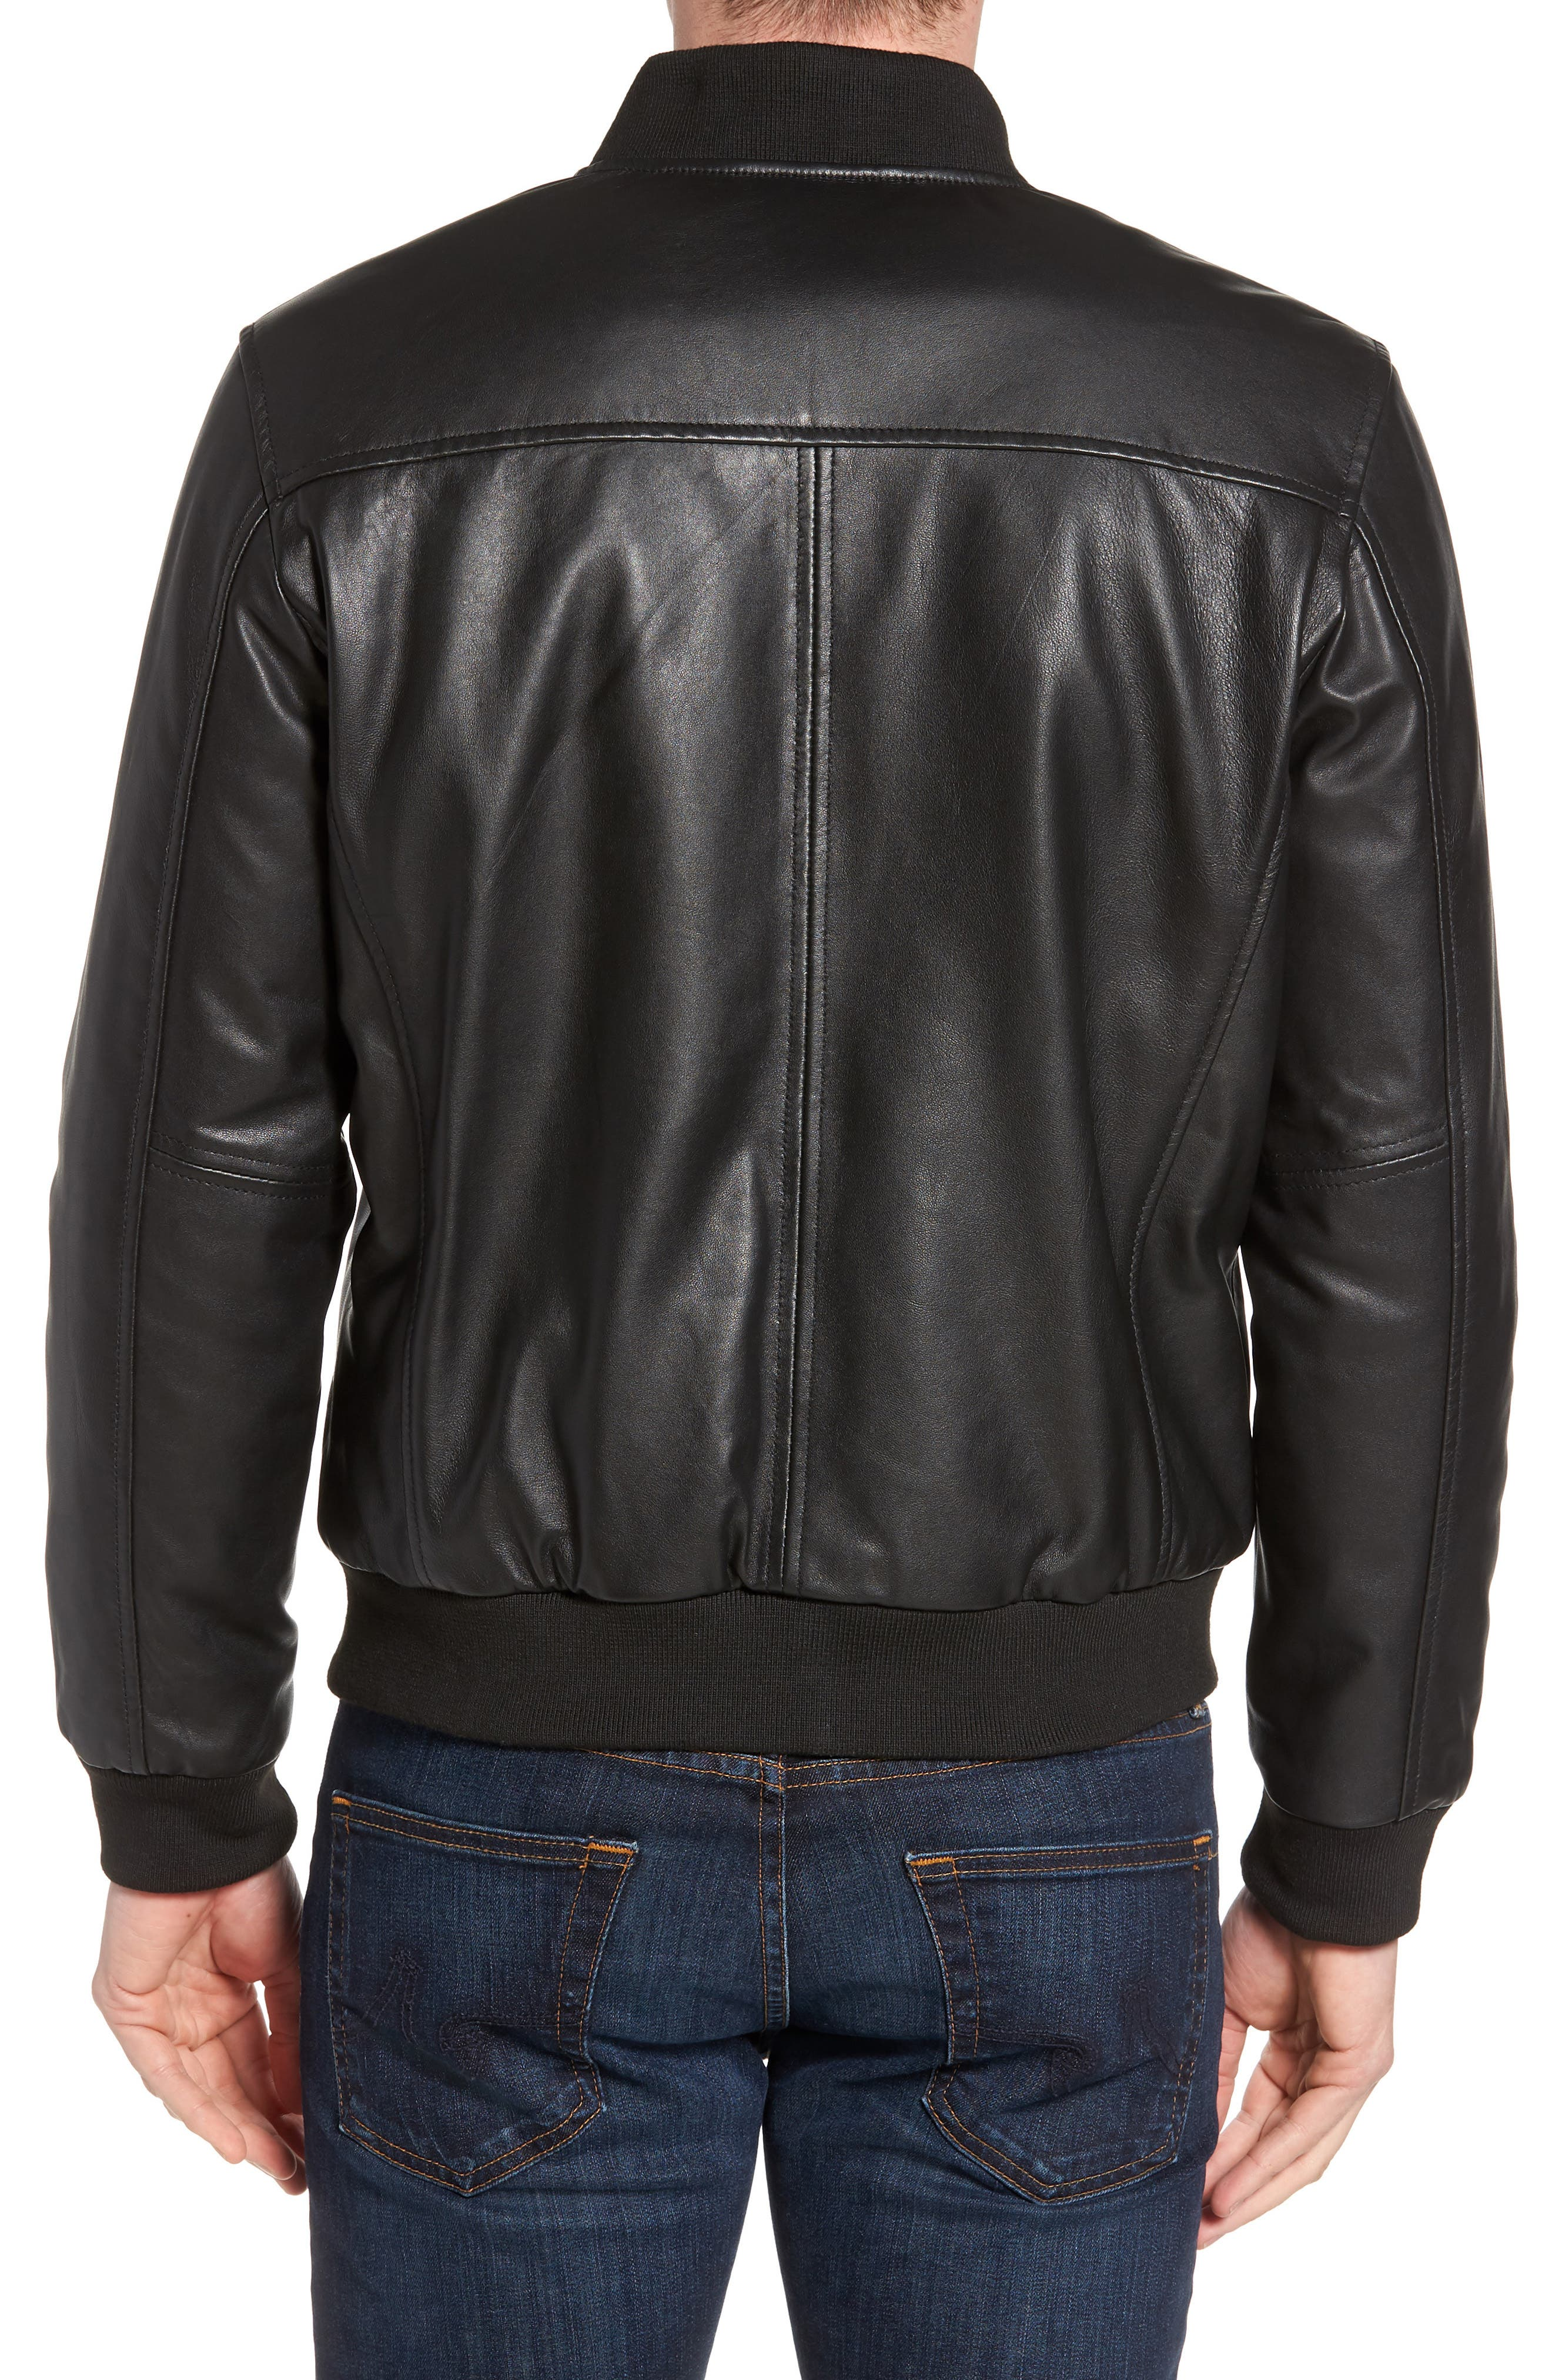 Reversible Leather Jacket,                             Alternate thumbnail 3, color,                             Black/ Navy